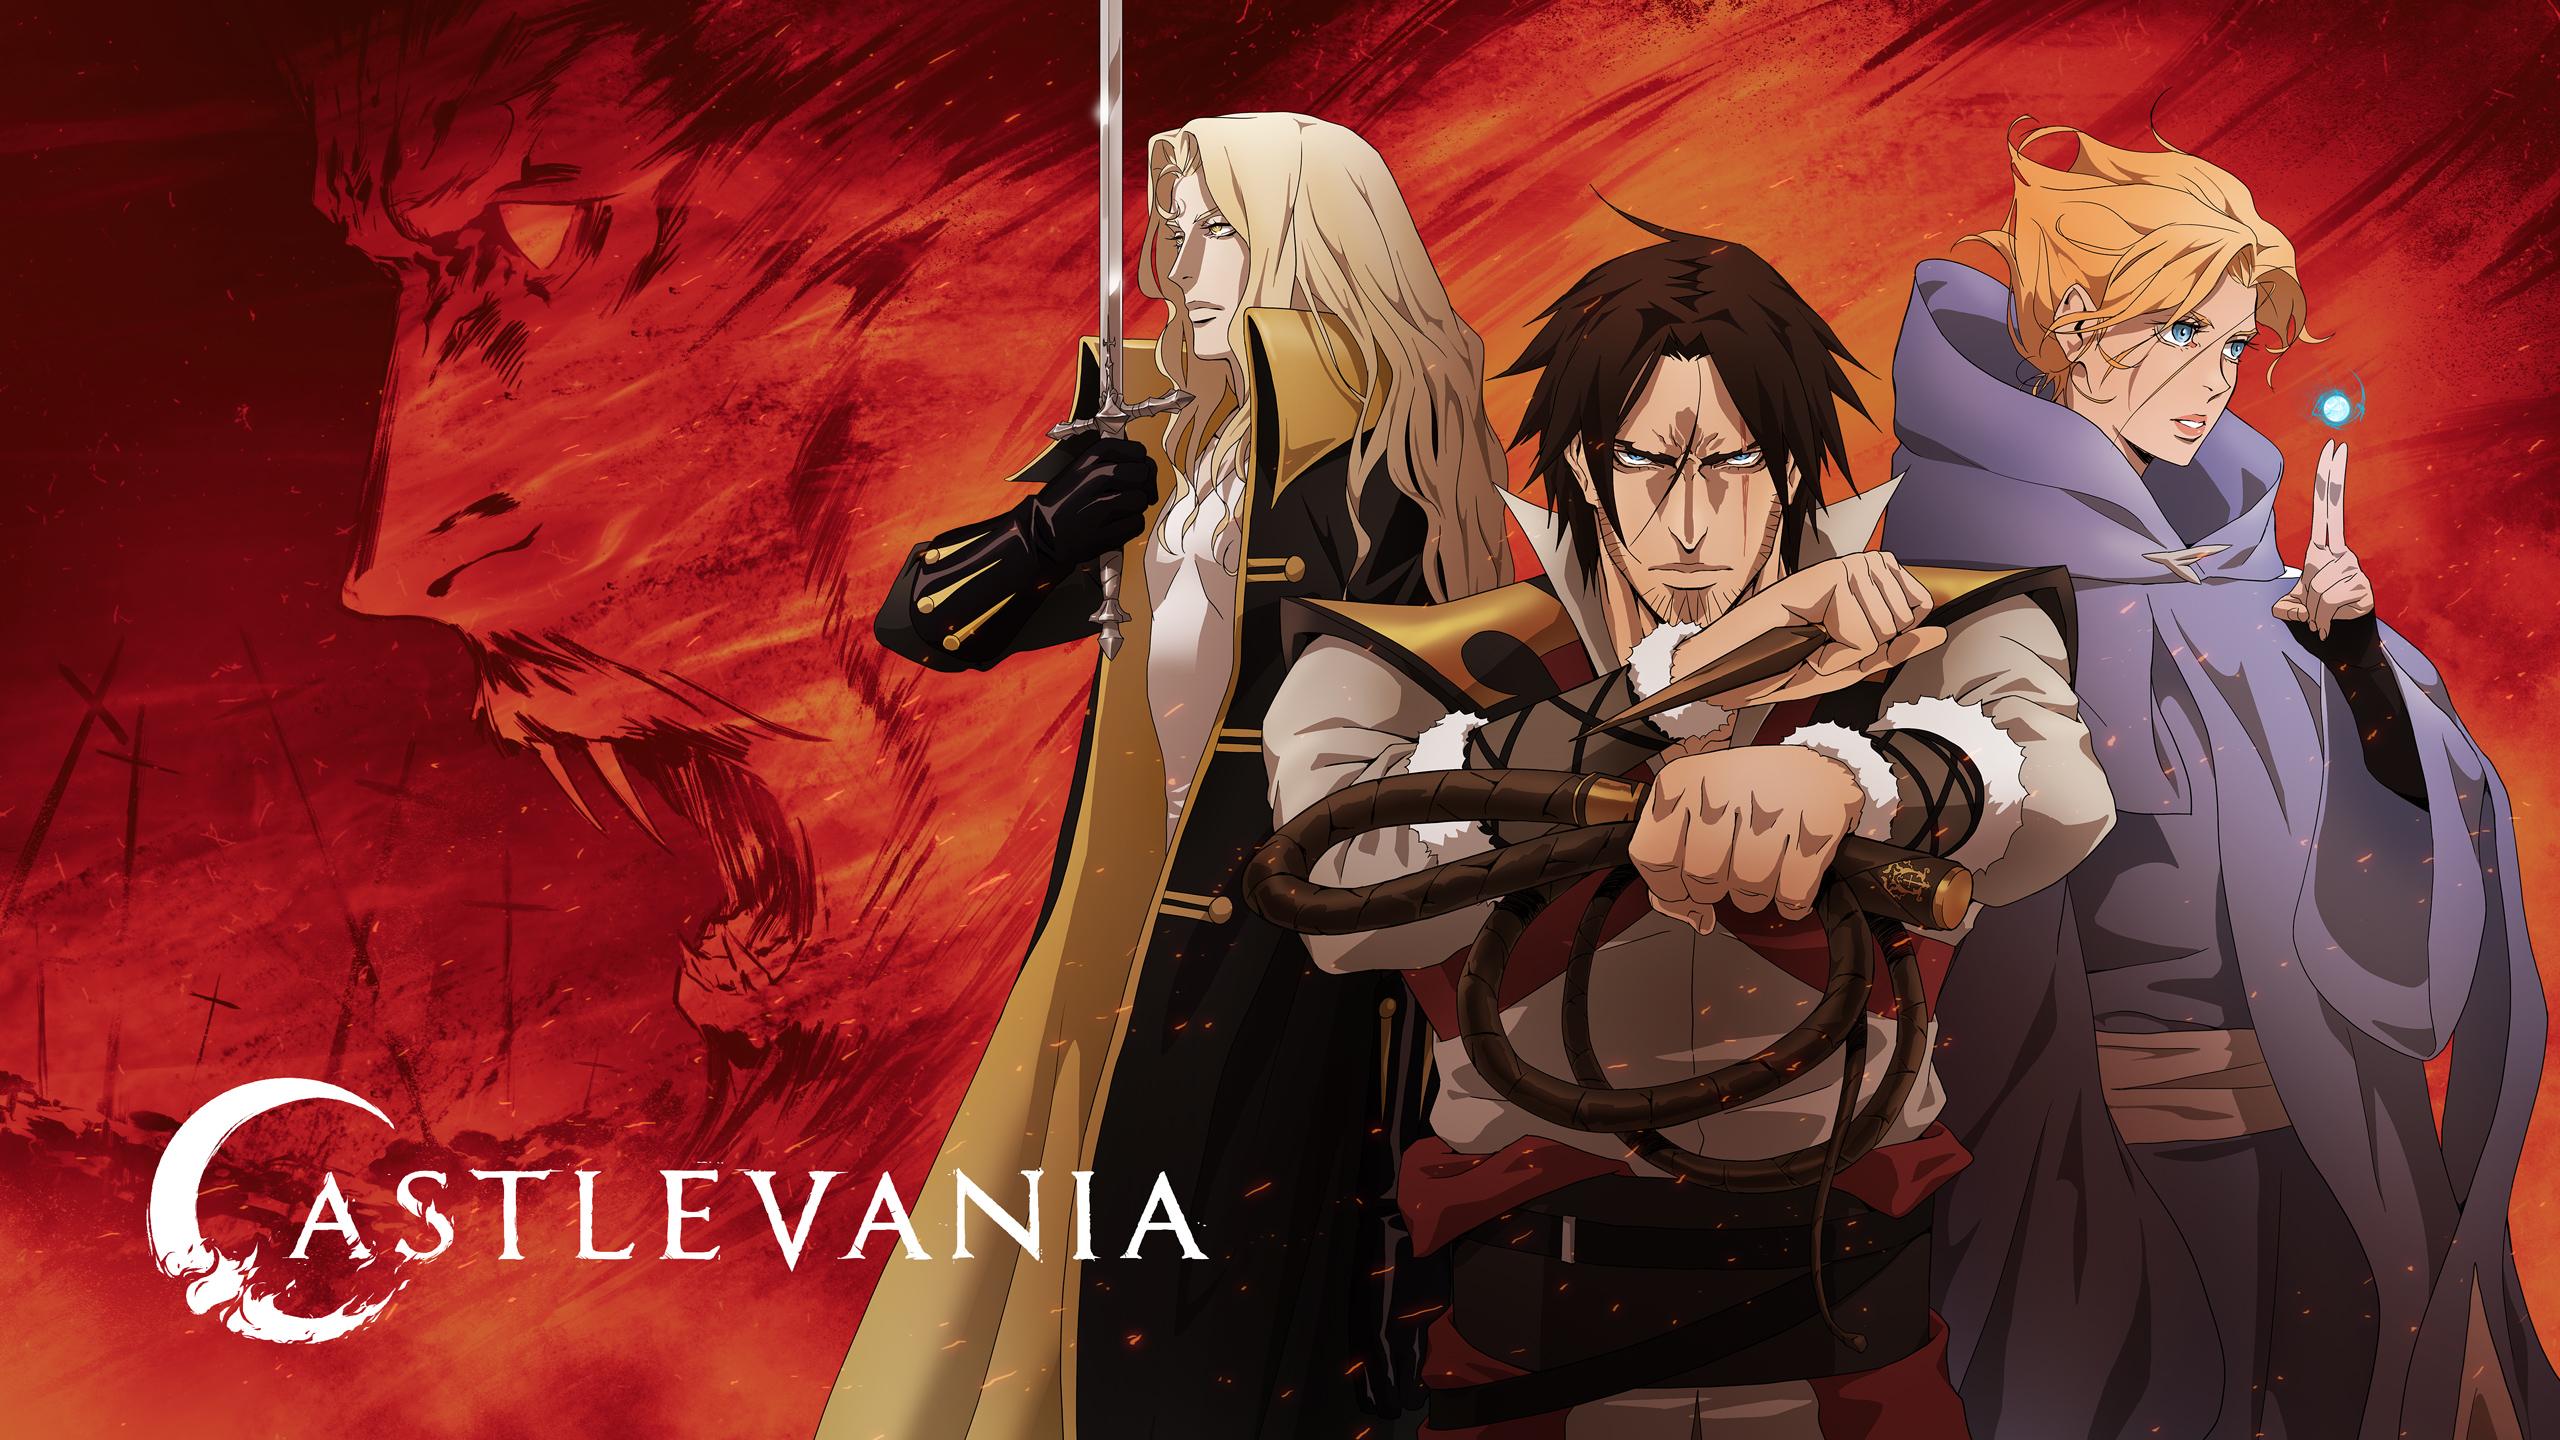 Anime 2560x1440 Netflix Castlevania TV Castlevania (anime) tv series